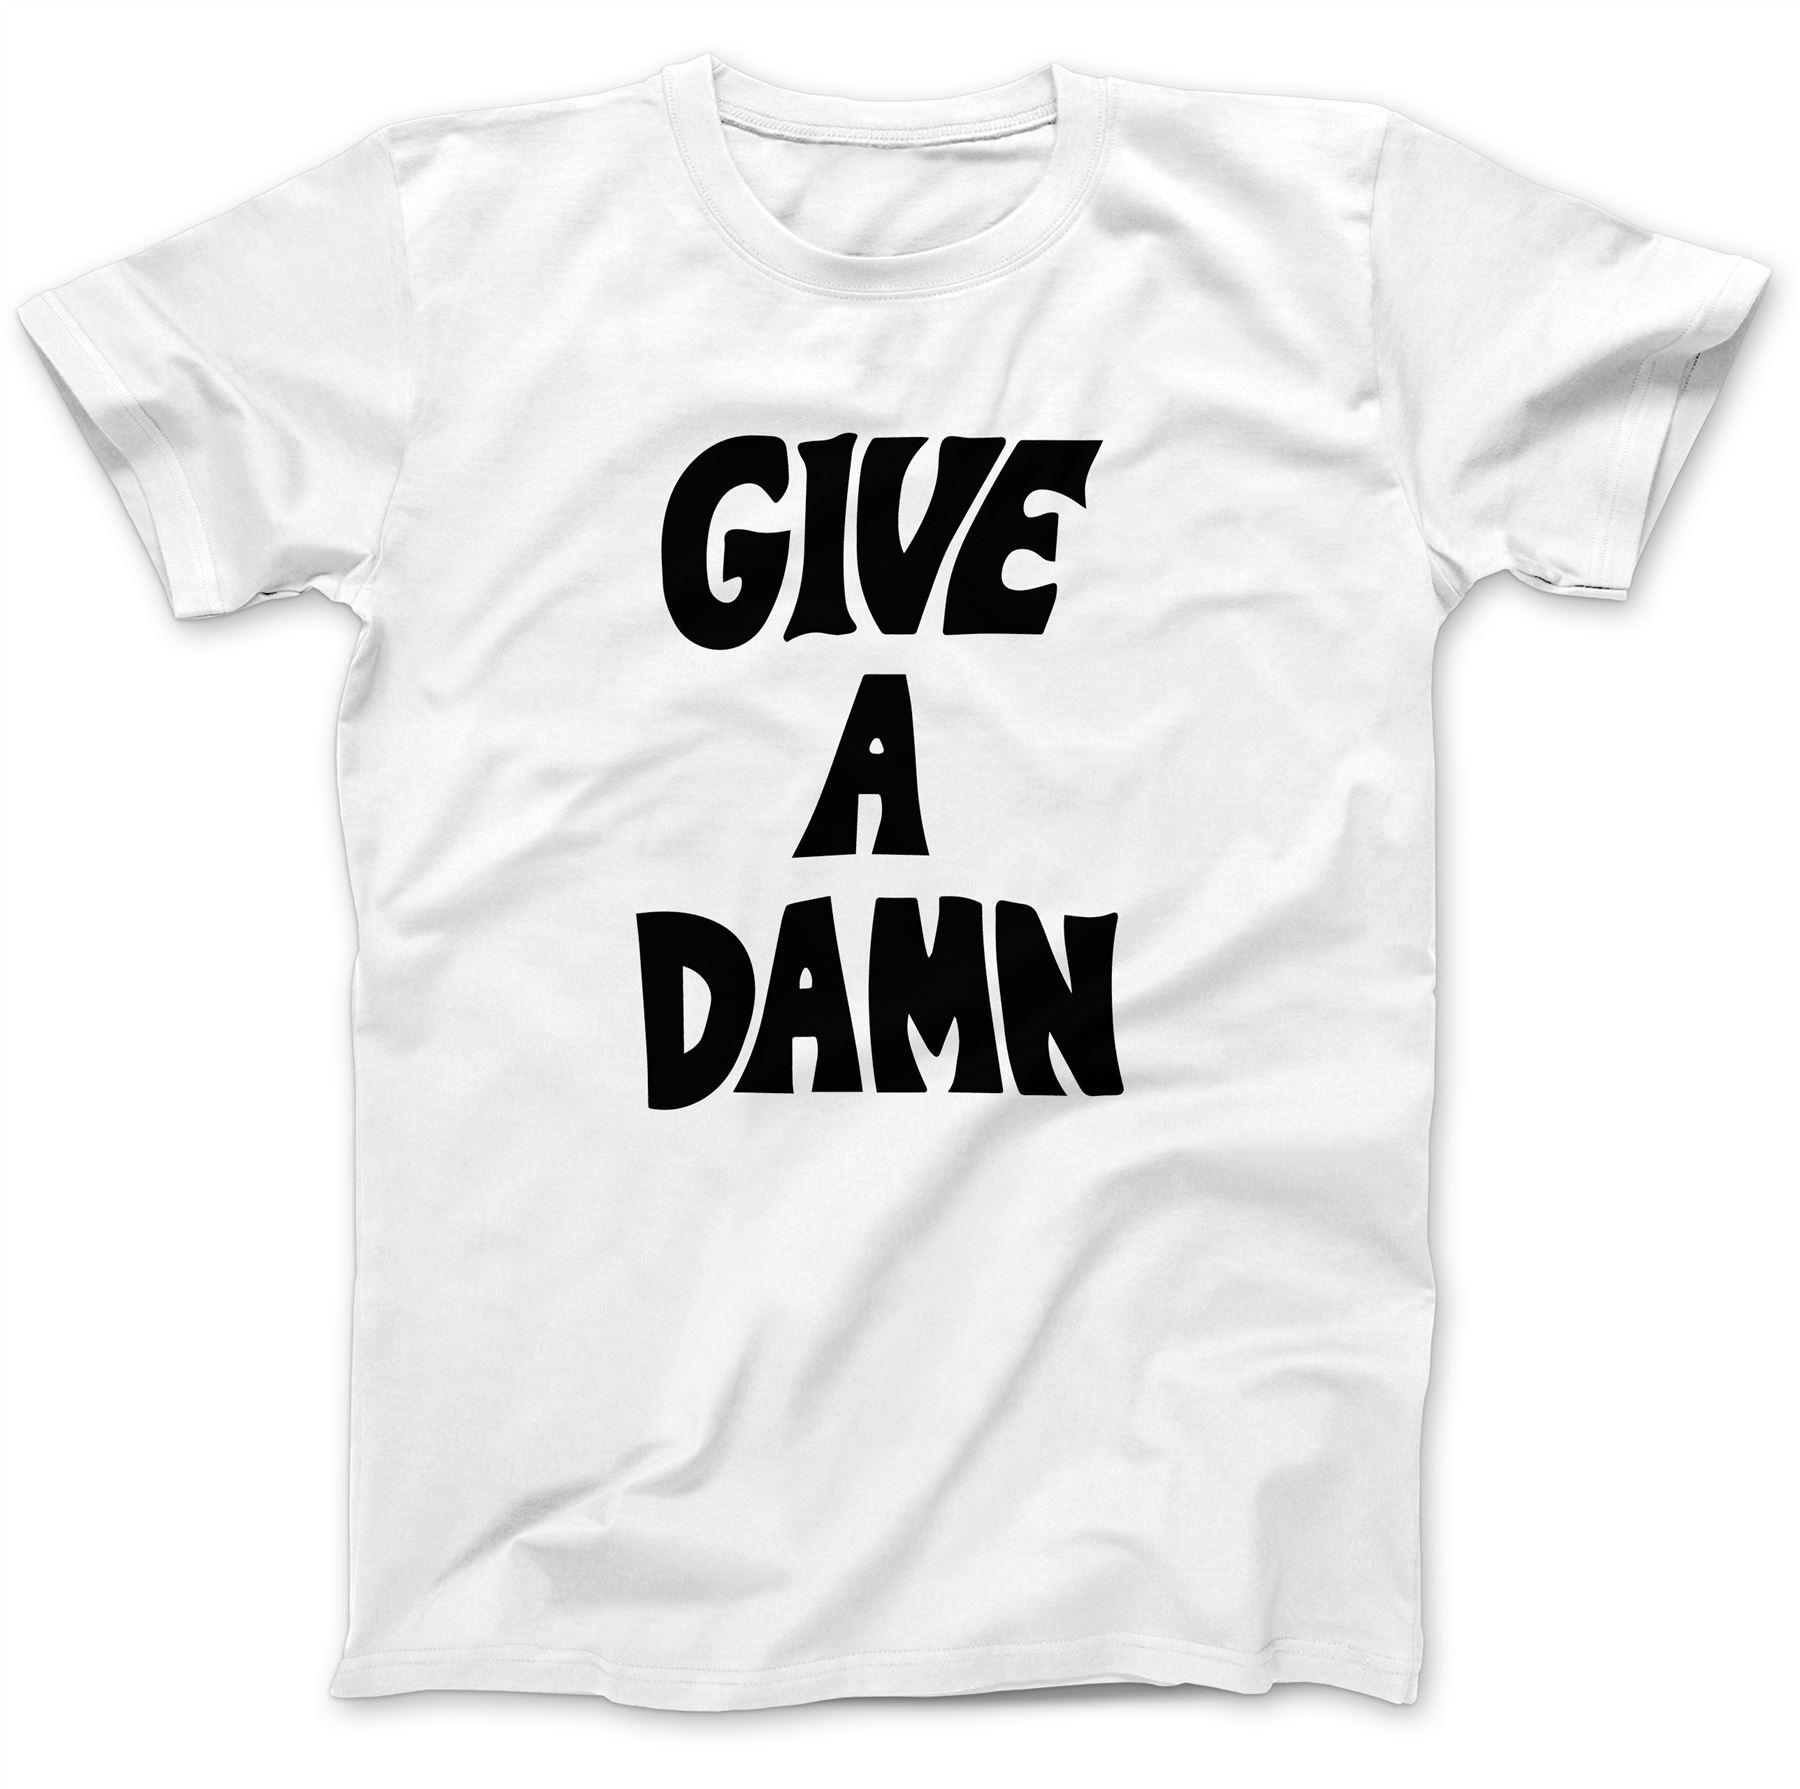 Give-A-Damn-As-Worn-By-Alex-Turner-T-Shirt-100-Premium-Cotton-Music-Gift miniatuur 9